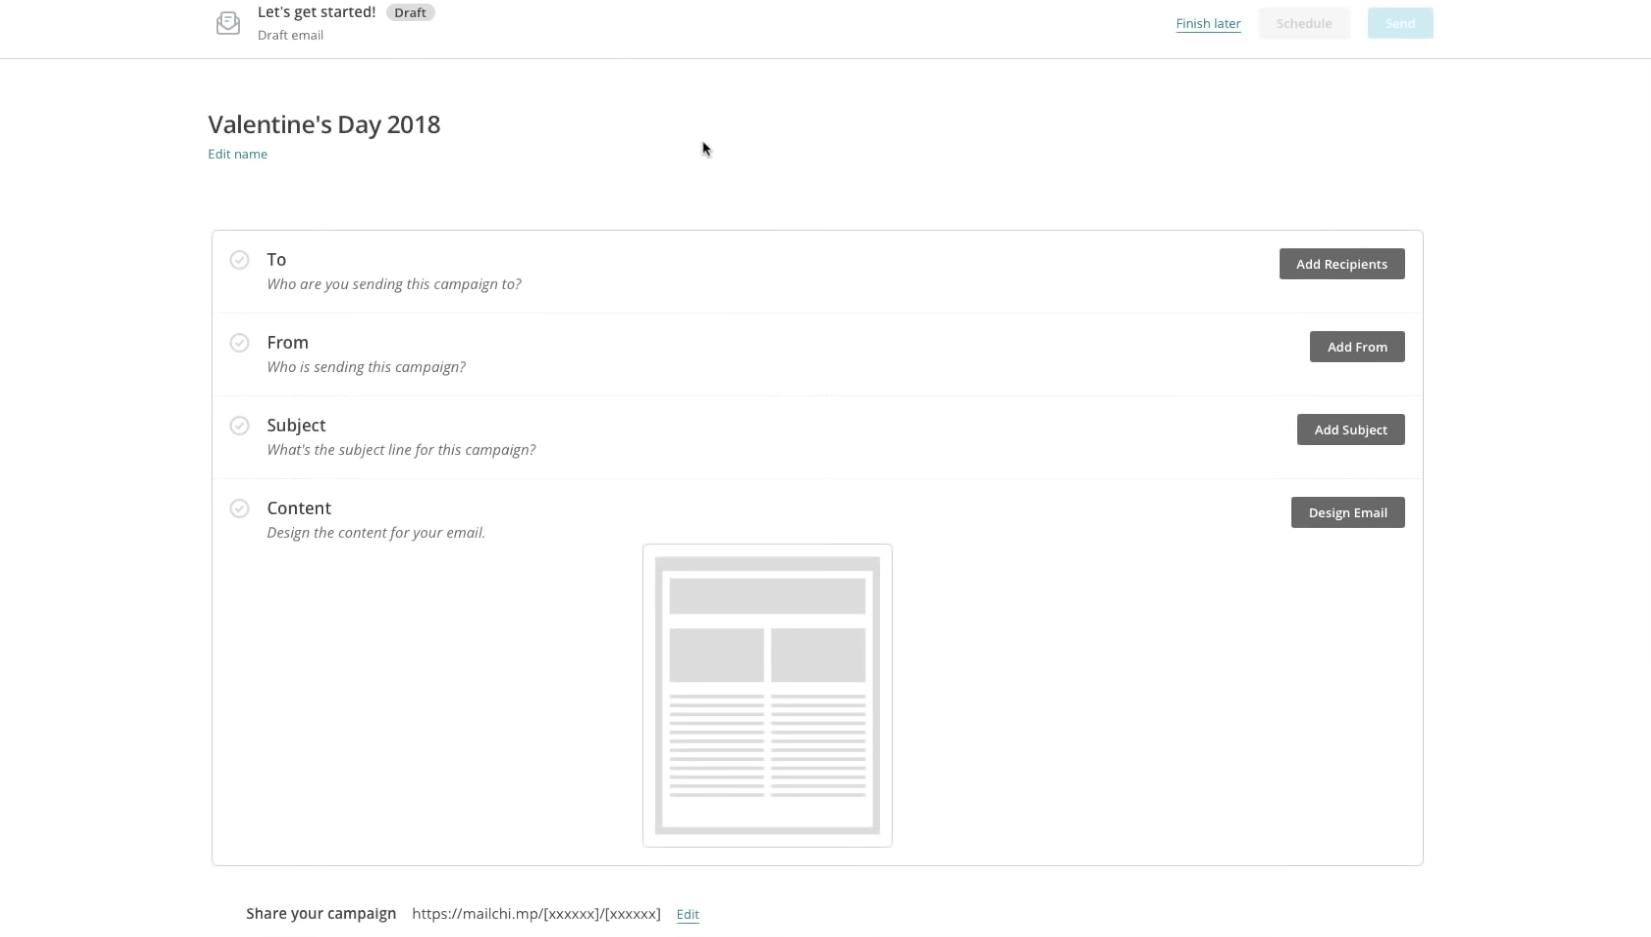 MailChip Email Draft Builder